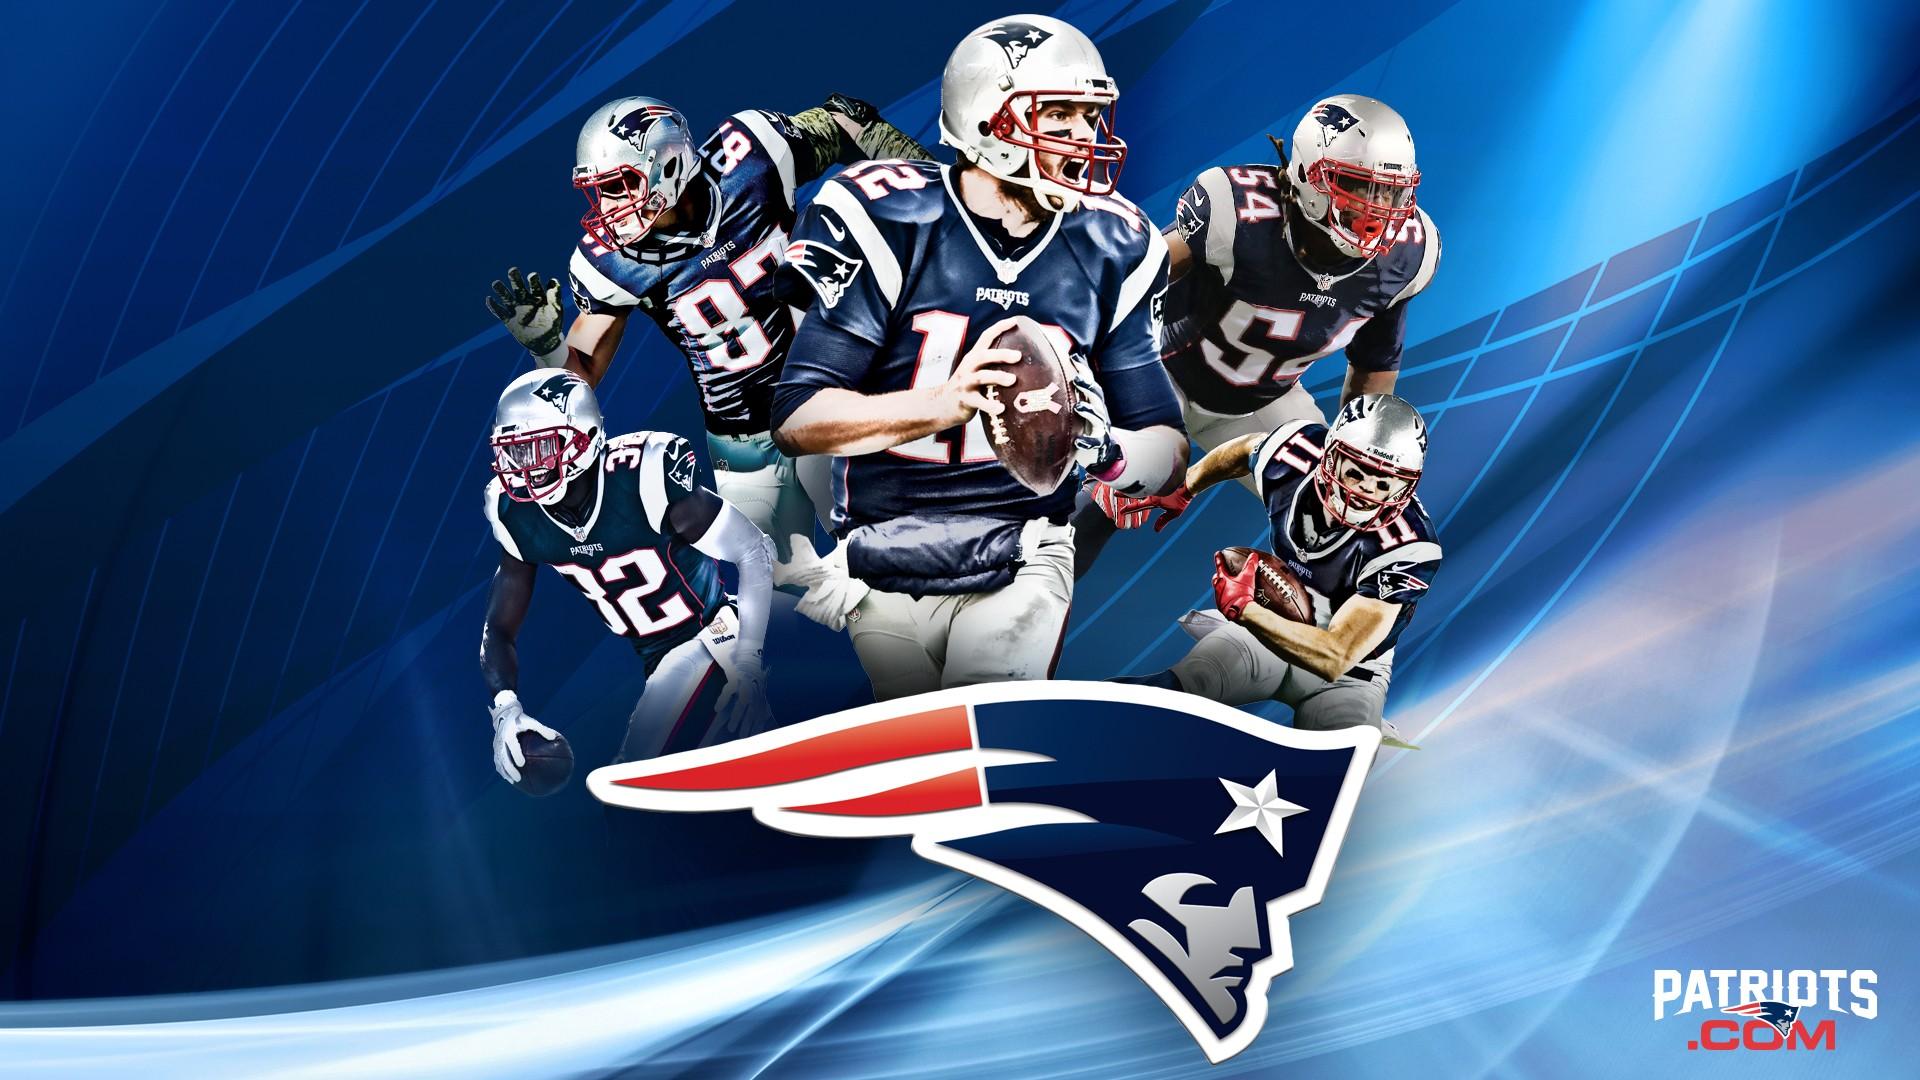 Tom Brady Wallpaper Iphone 7 New England Patriots Wallpaper 183 ① Download Free High